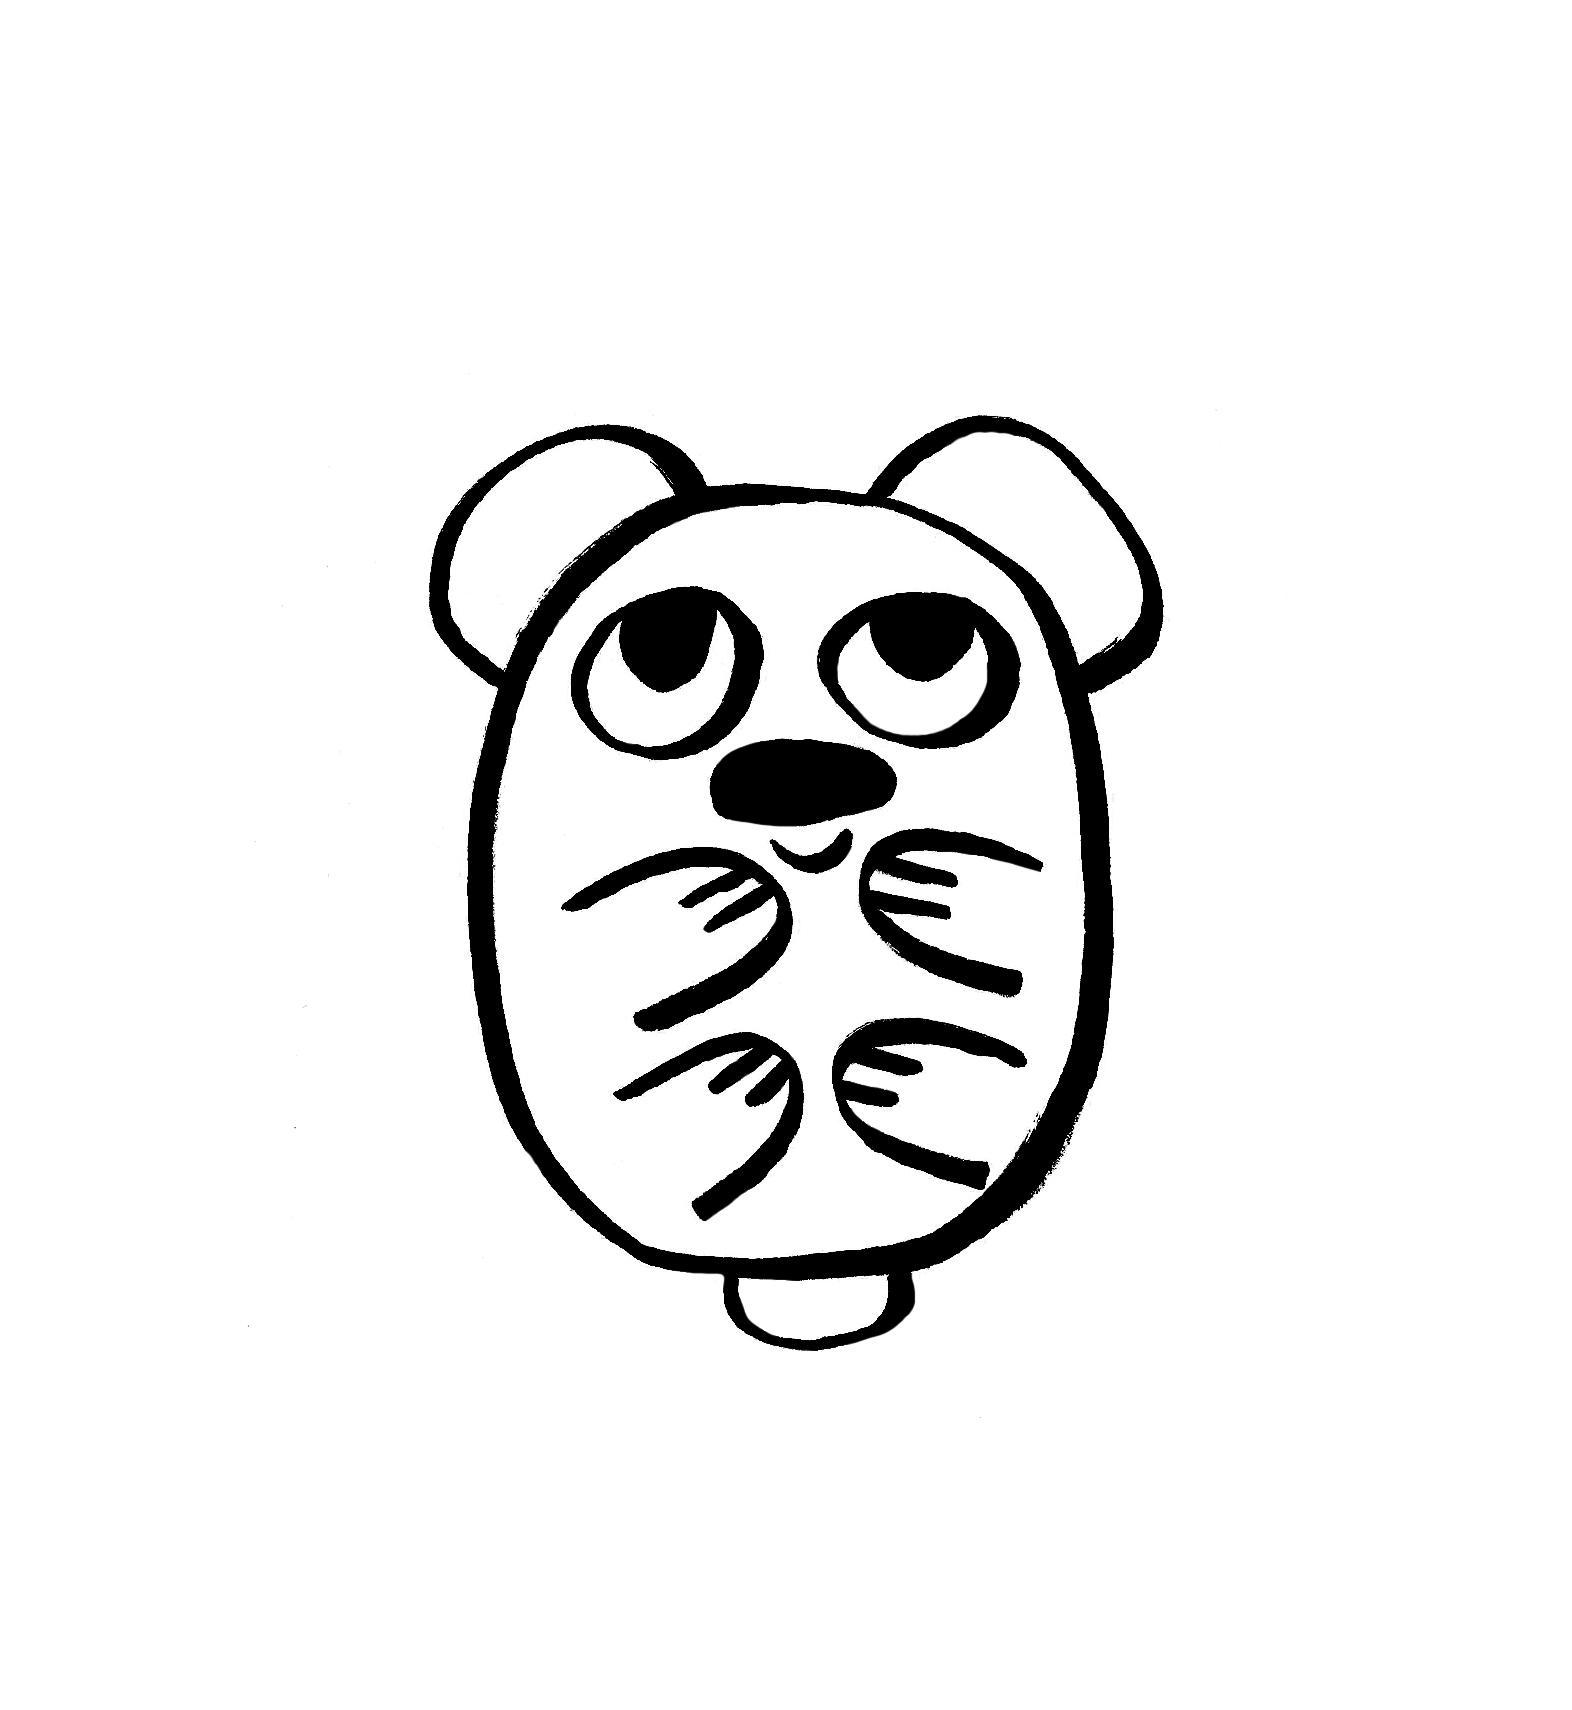 bearloaf.jpg